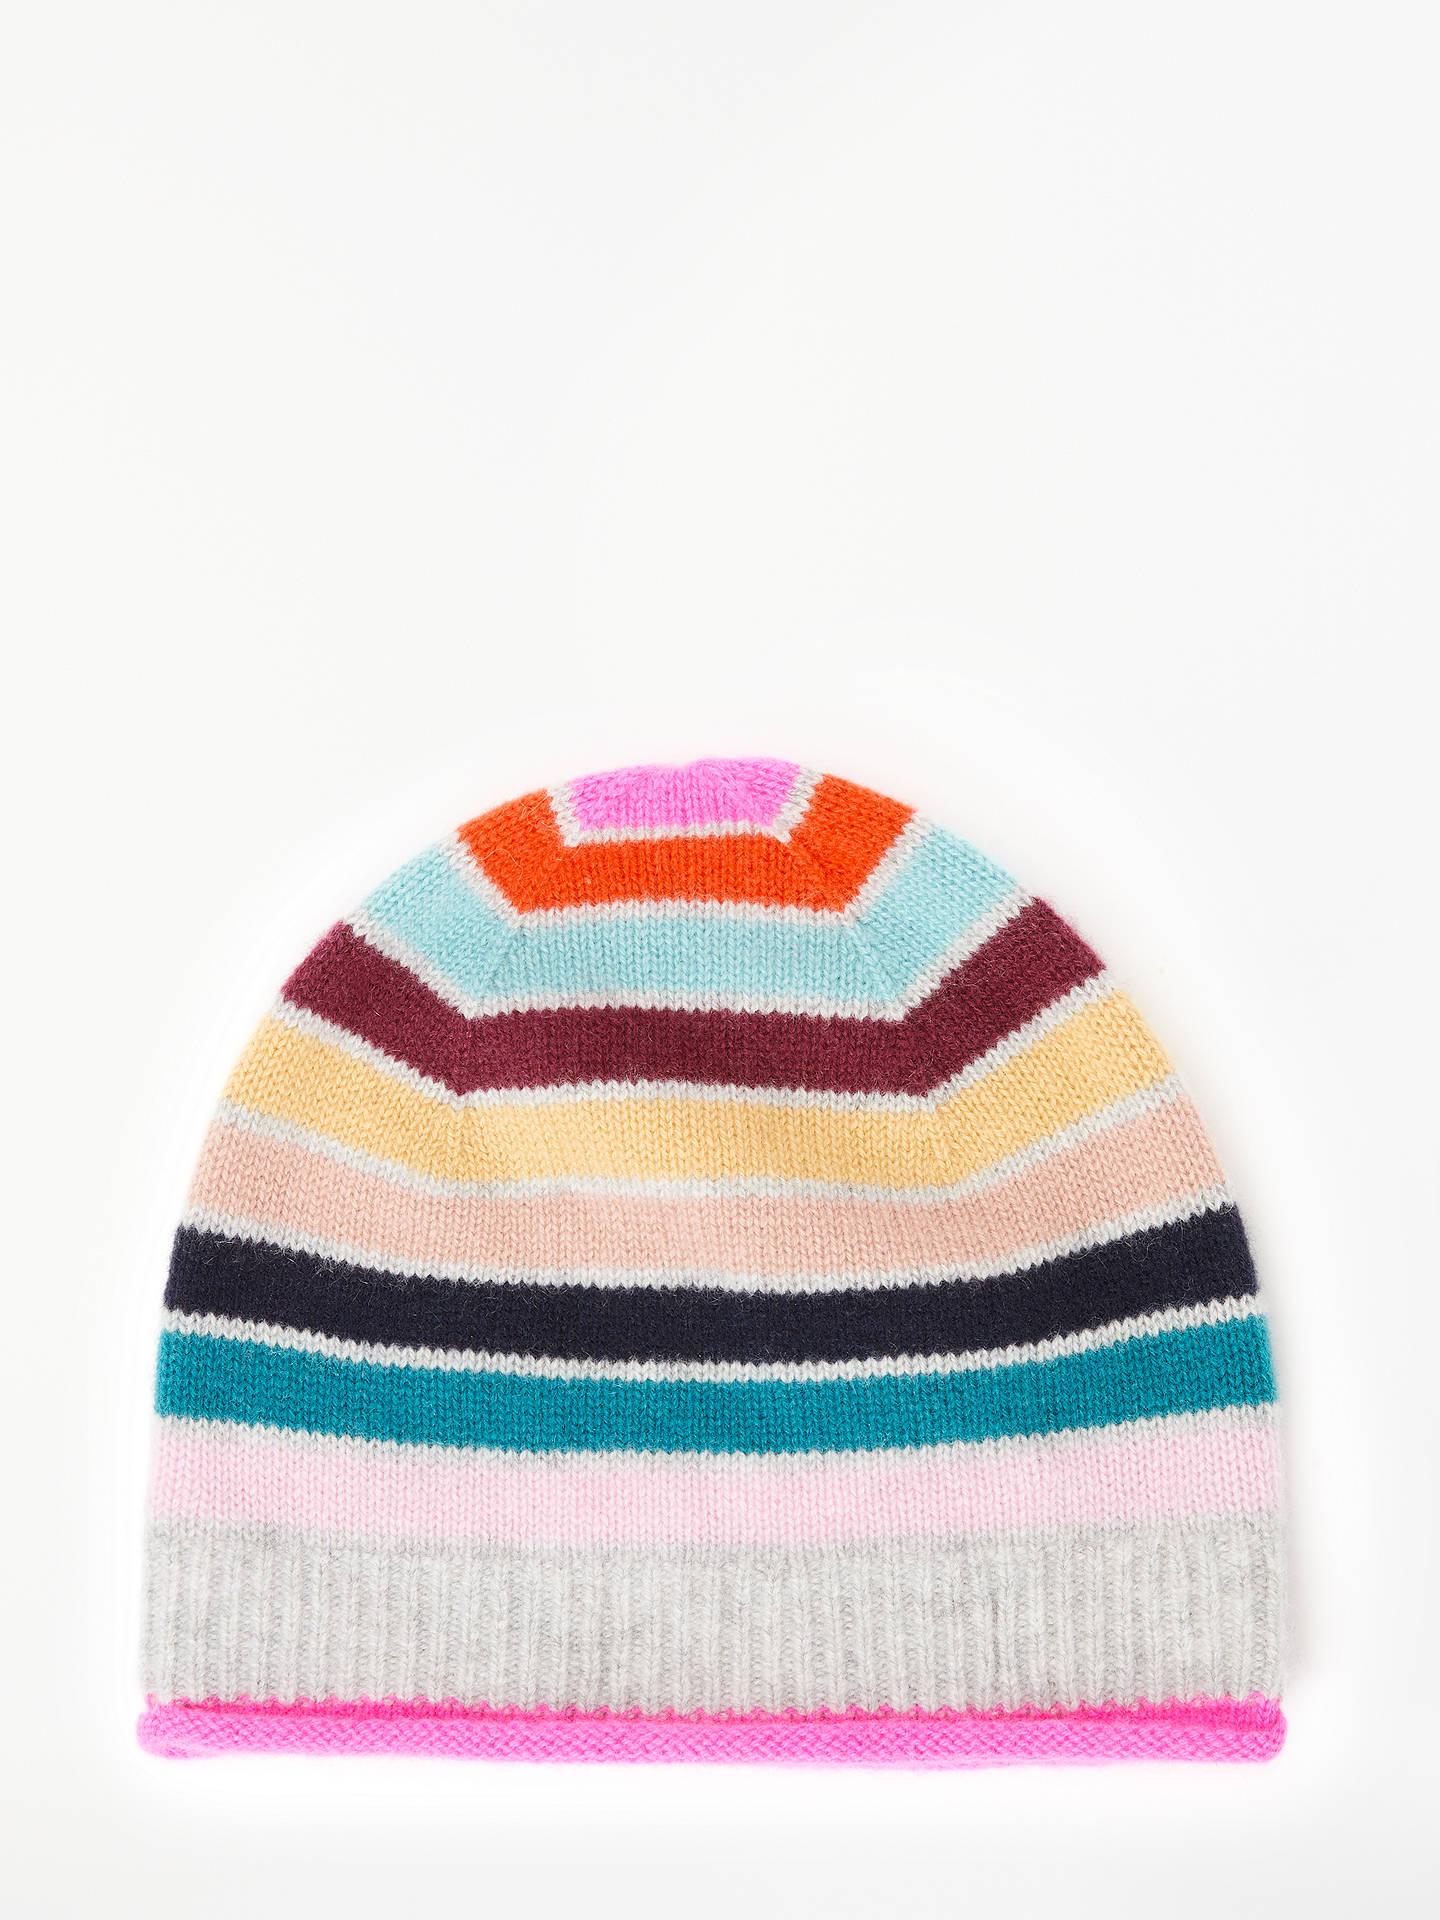 21abb18fce569 ... Buy Boden Stripe Detail Cashmere Beanie Hat